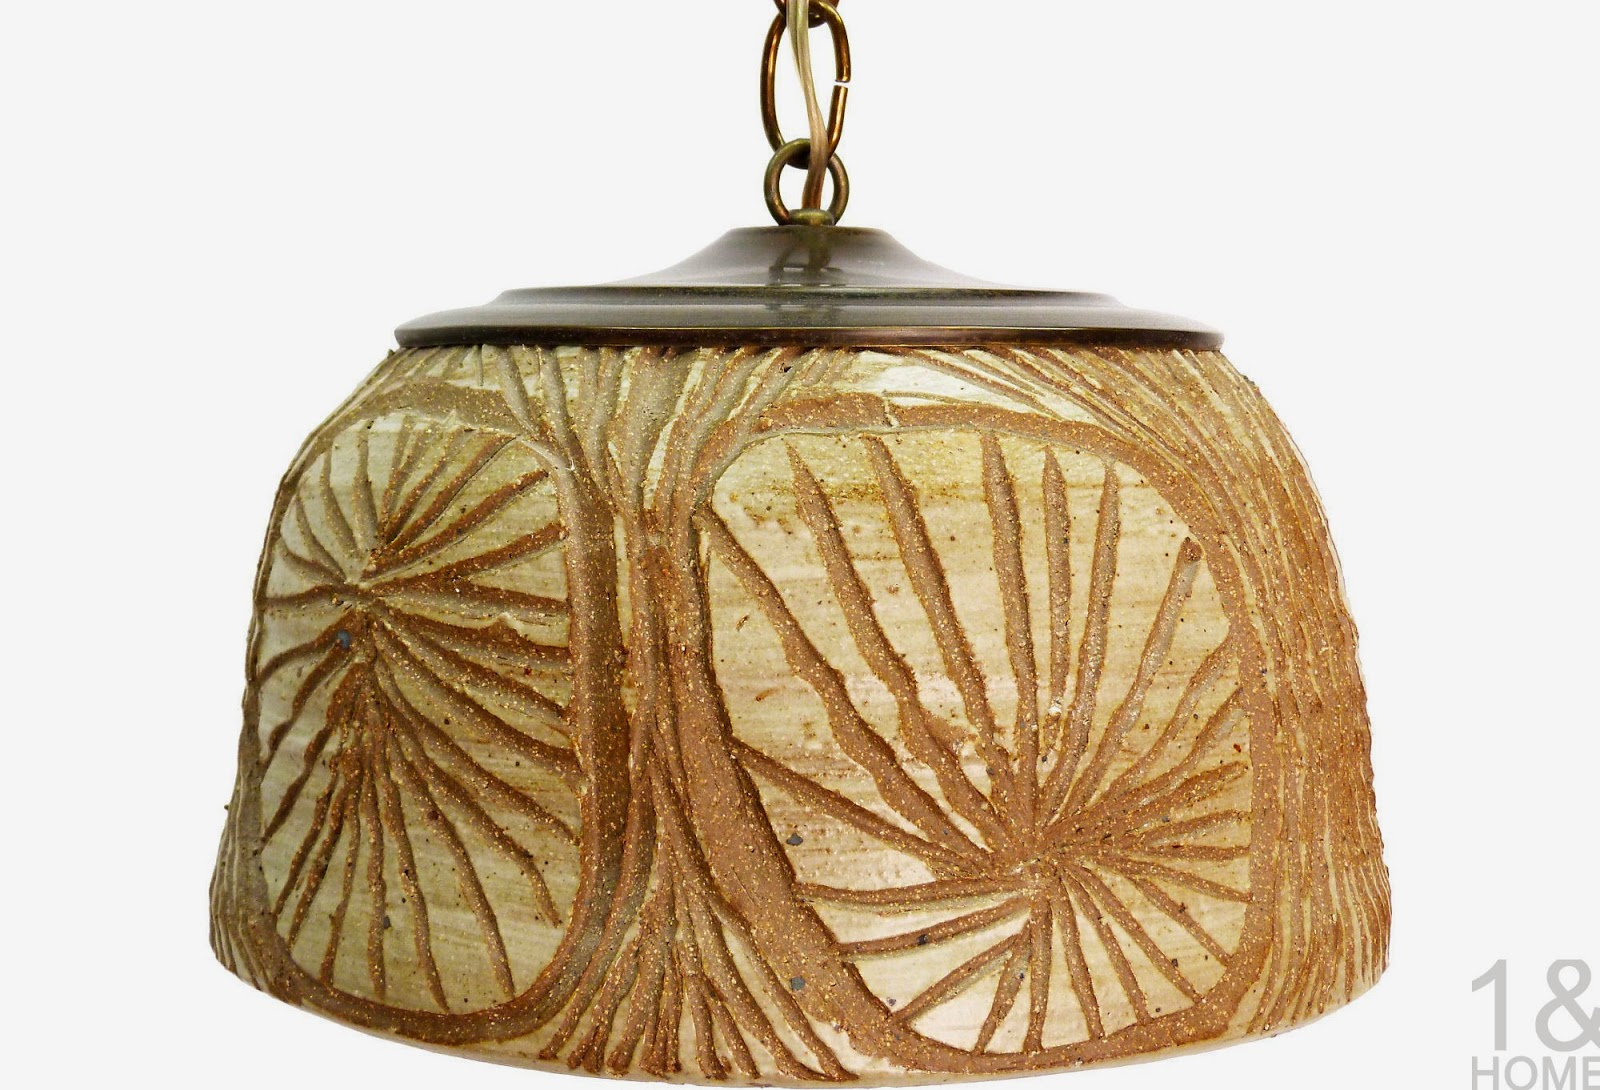 vintage sculptural earthenware ceramic glazed studio art pottery pendant ceiling light organic